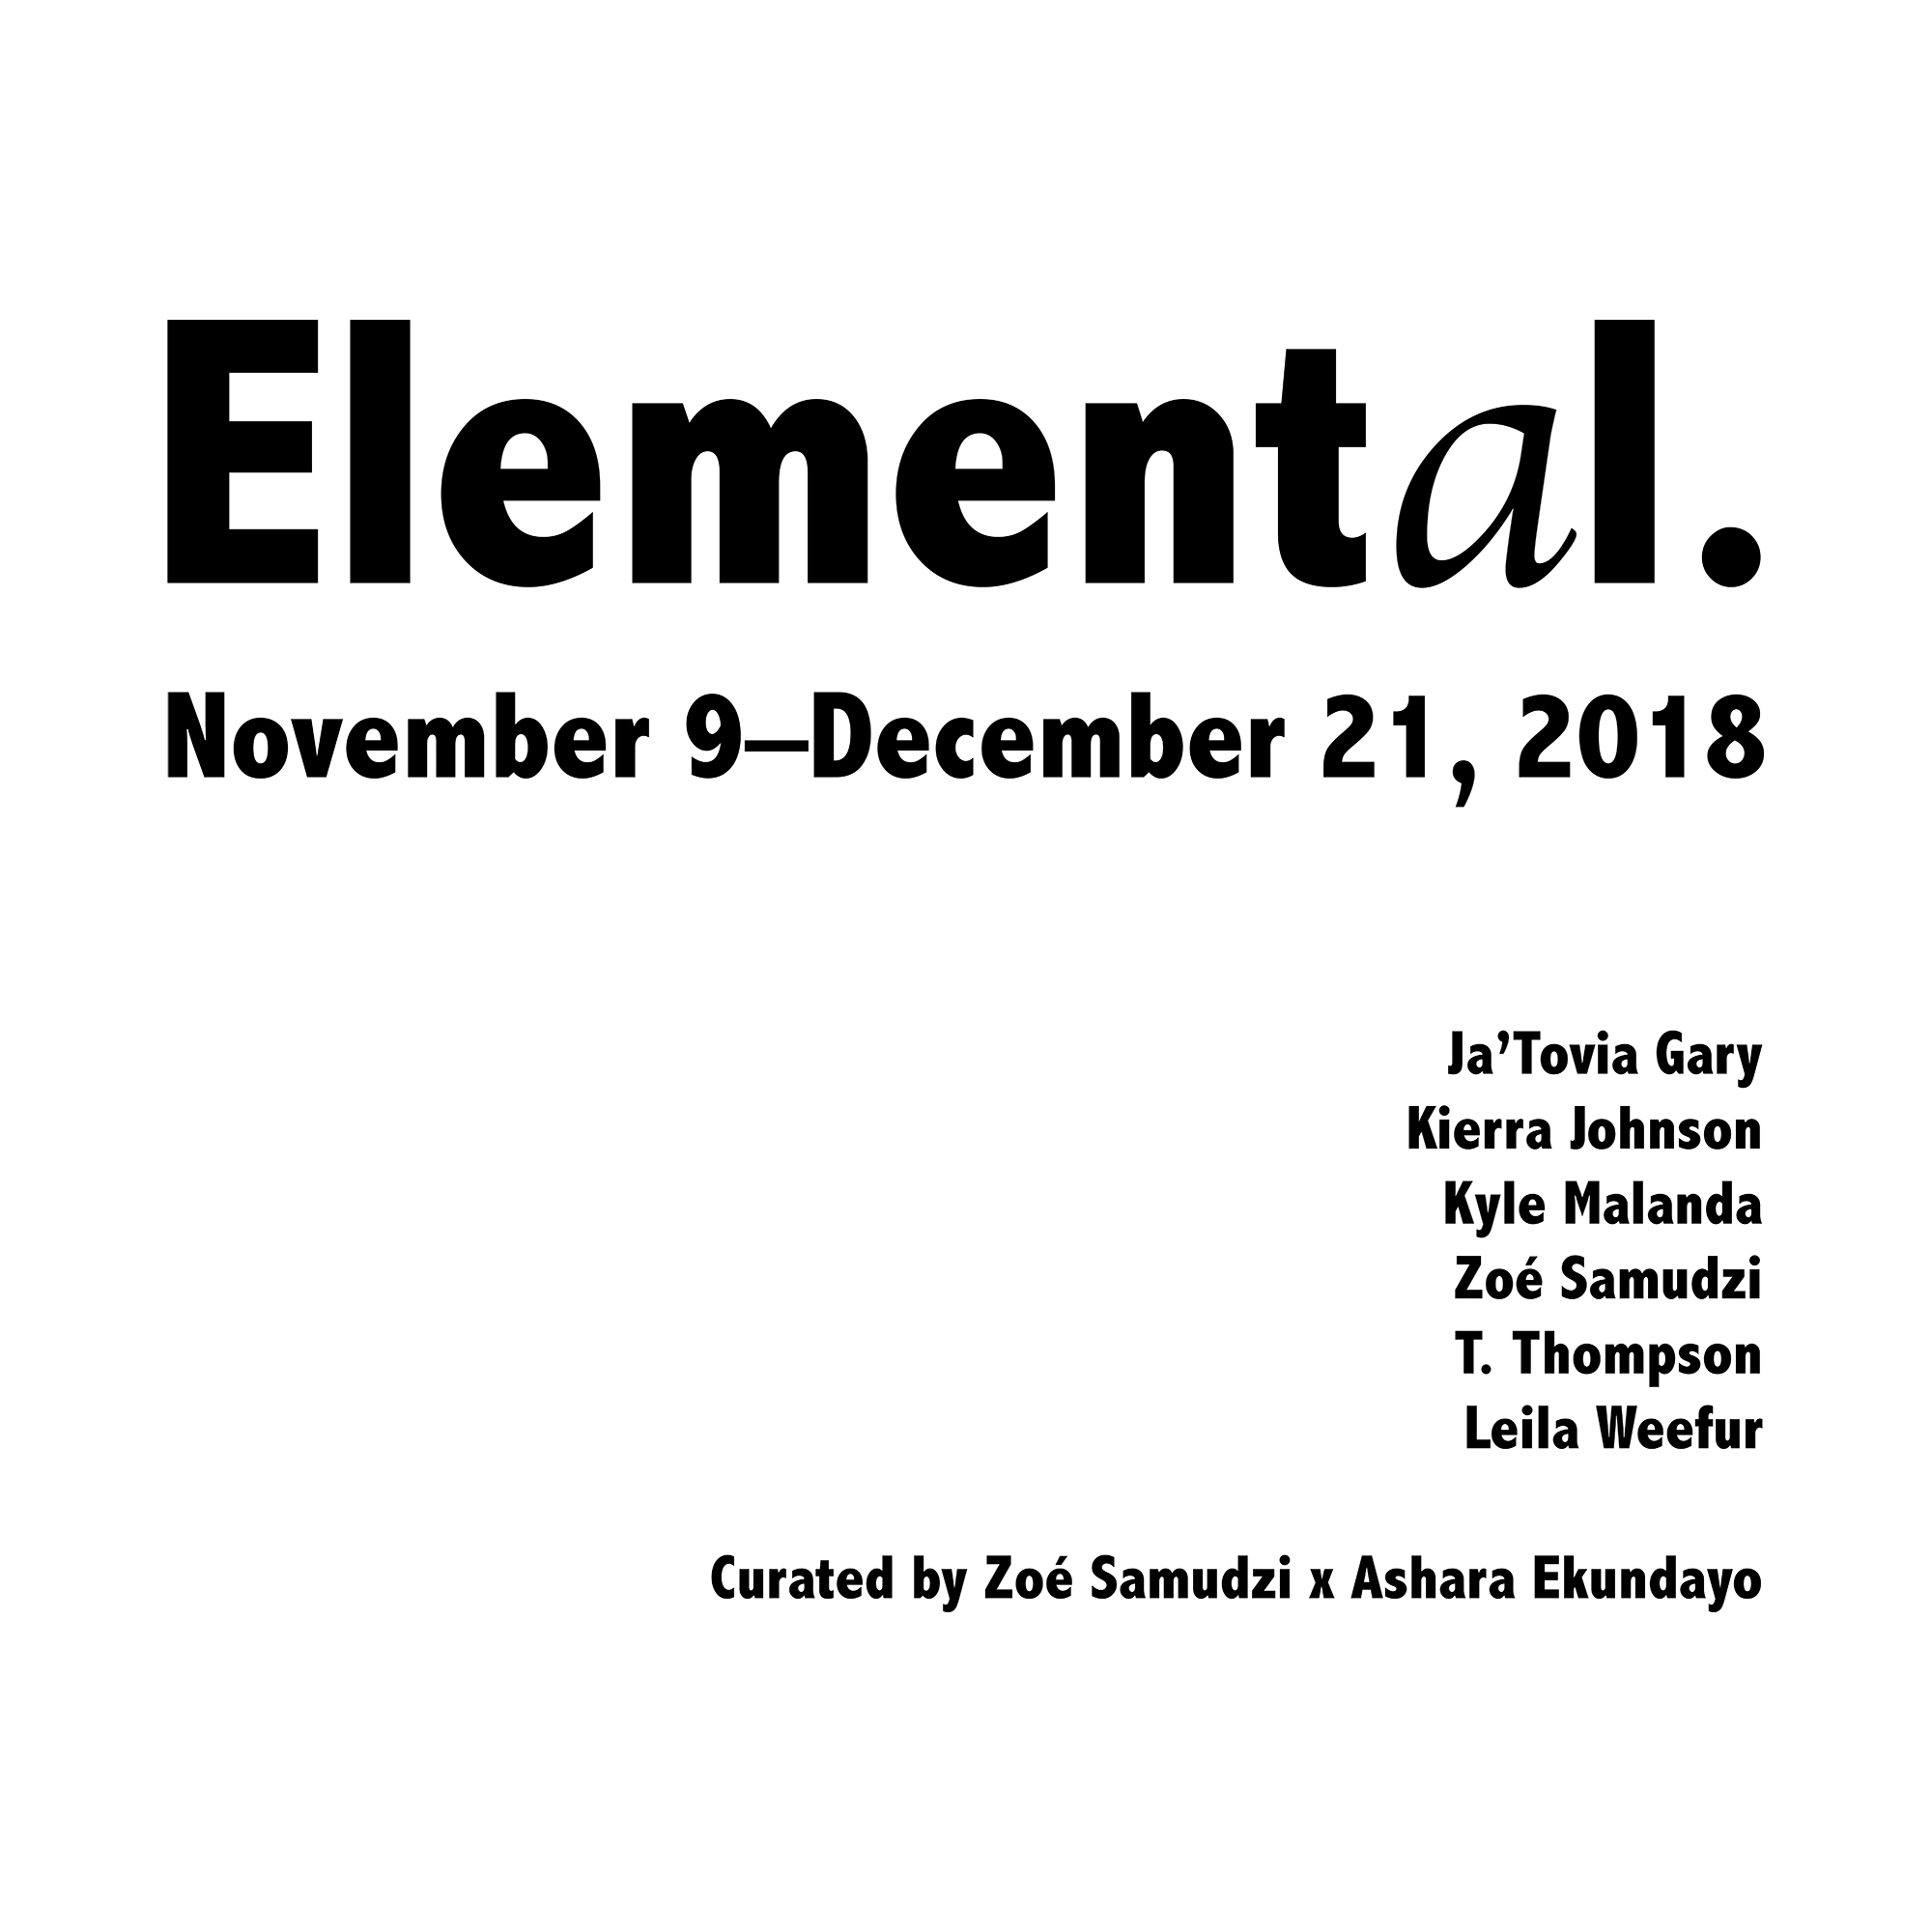 Elemental_square.jpg